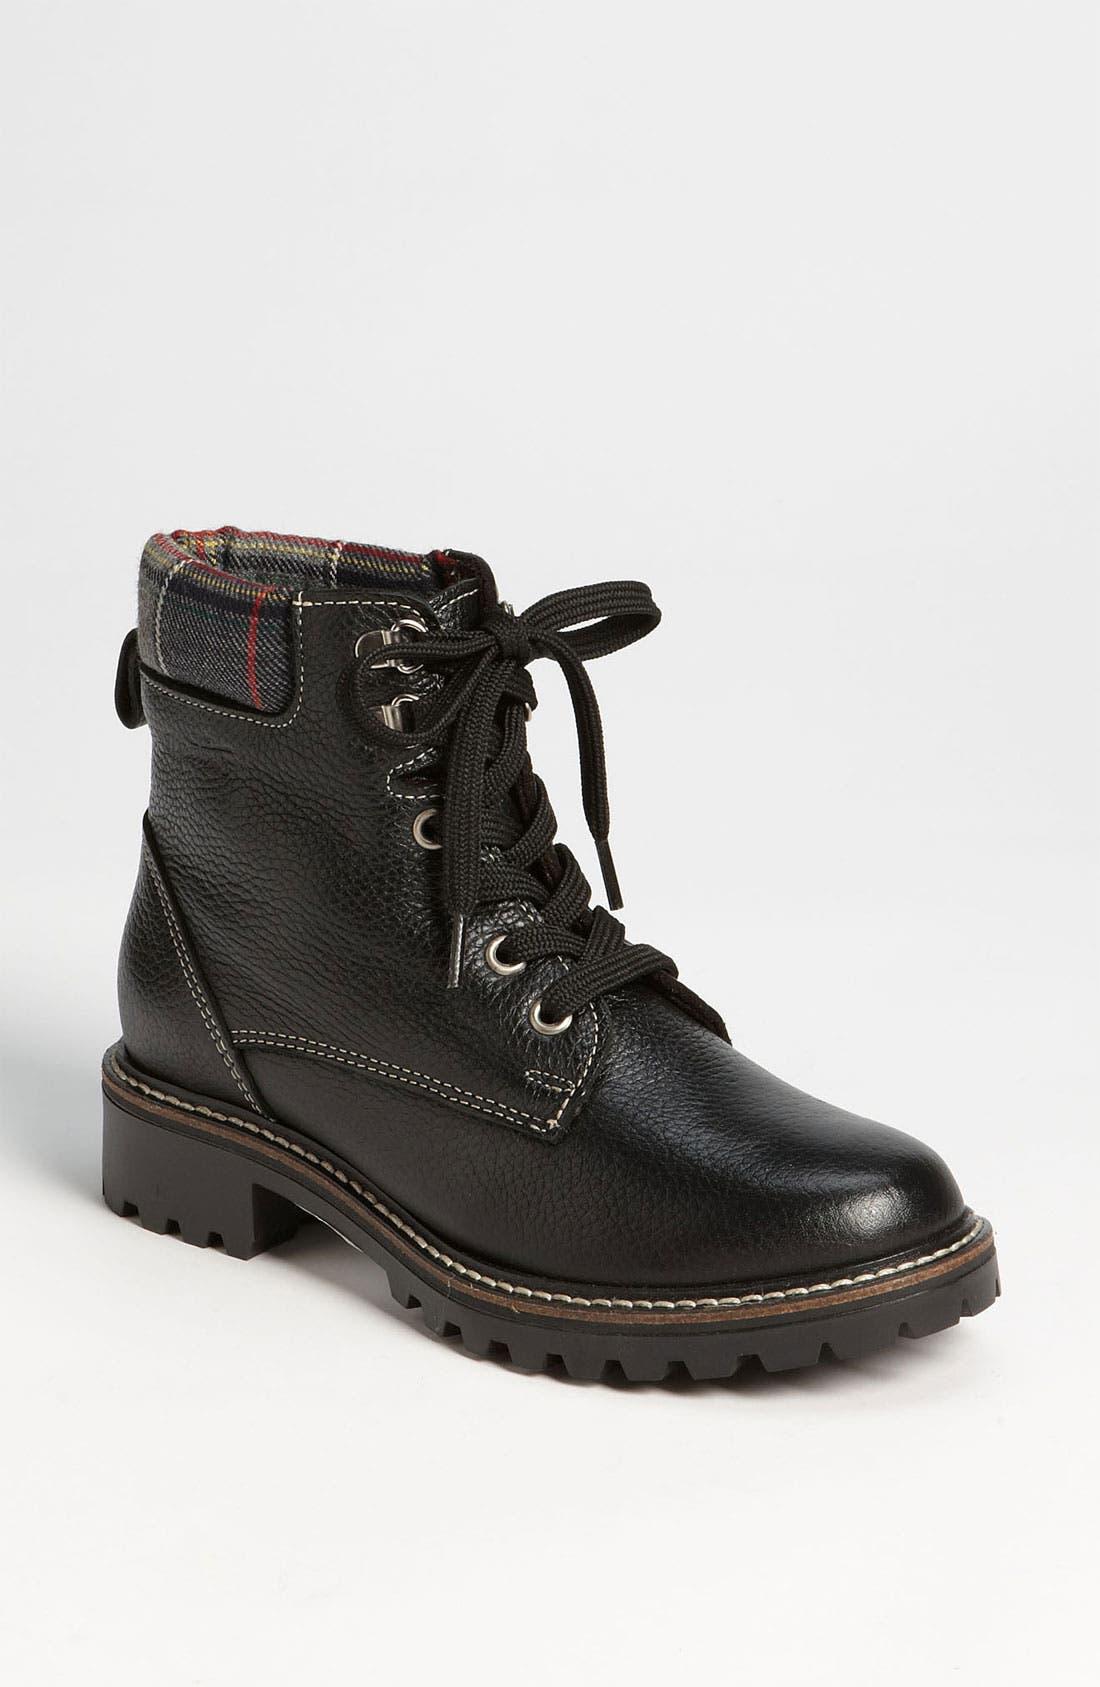 Alternate Image 1 Selected - Martino 'Penelope' Boot